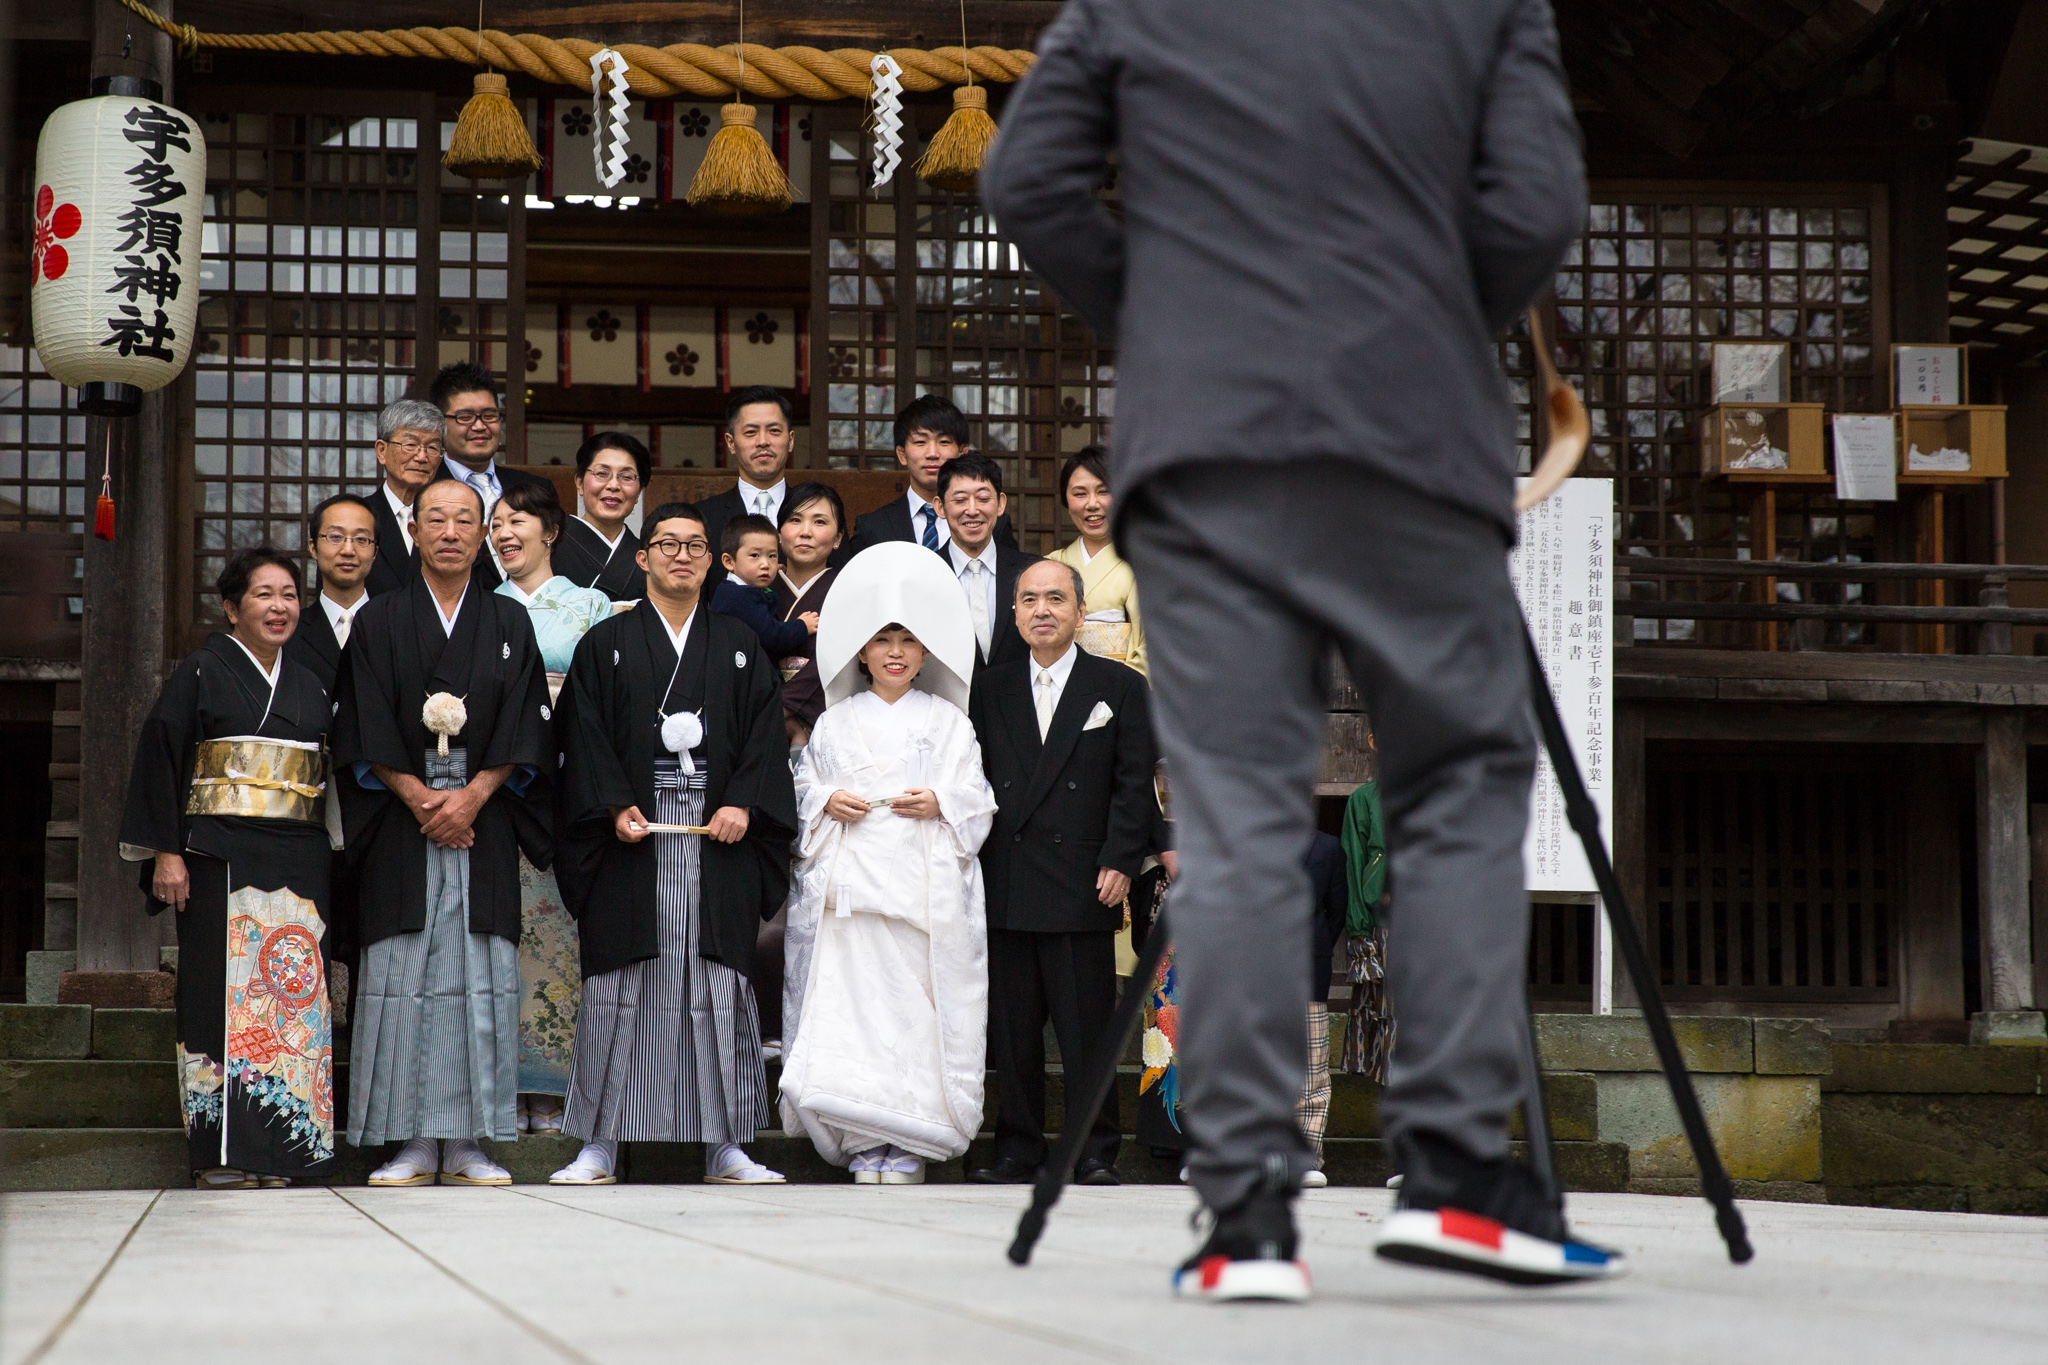 5718-japan-street-award-winning.jpg